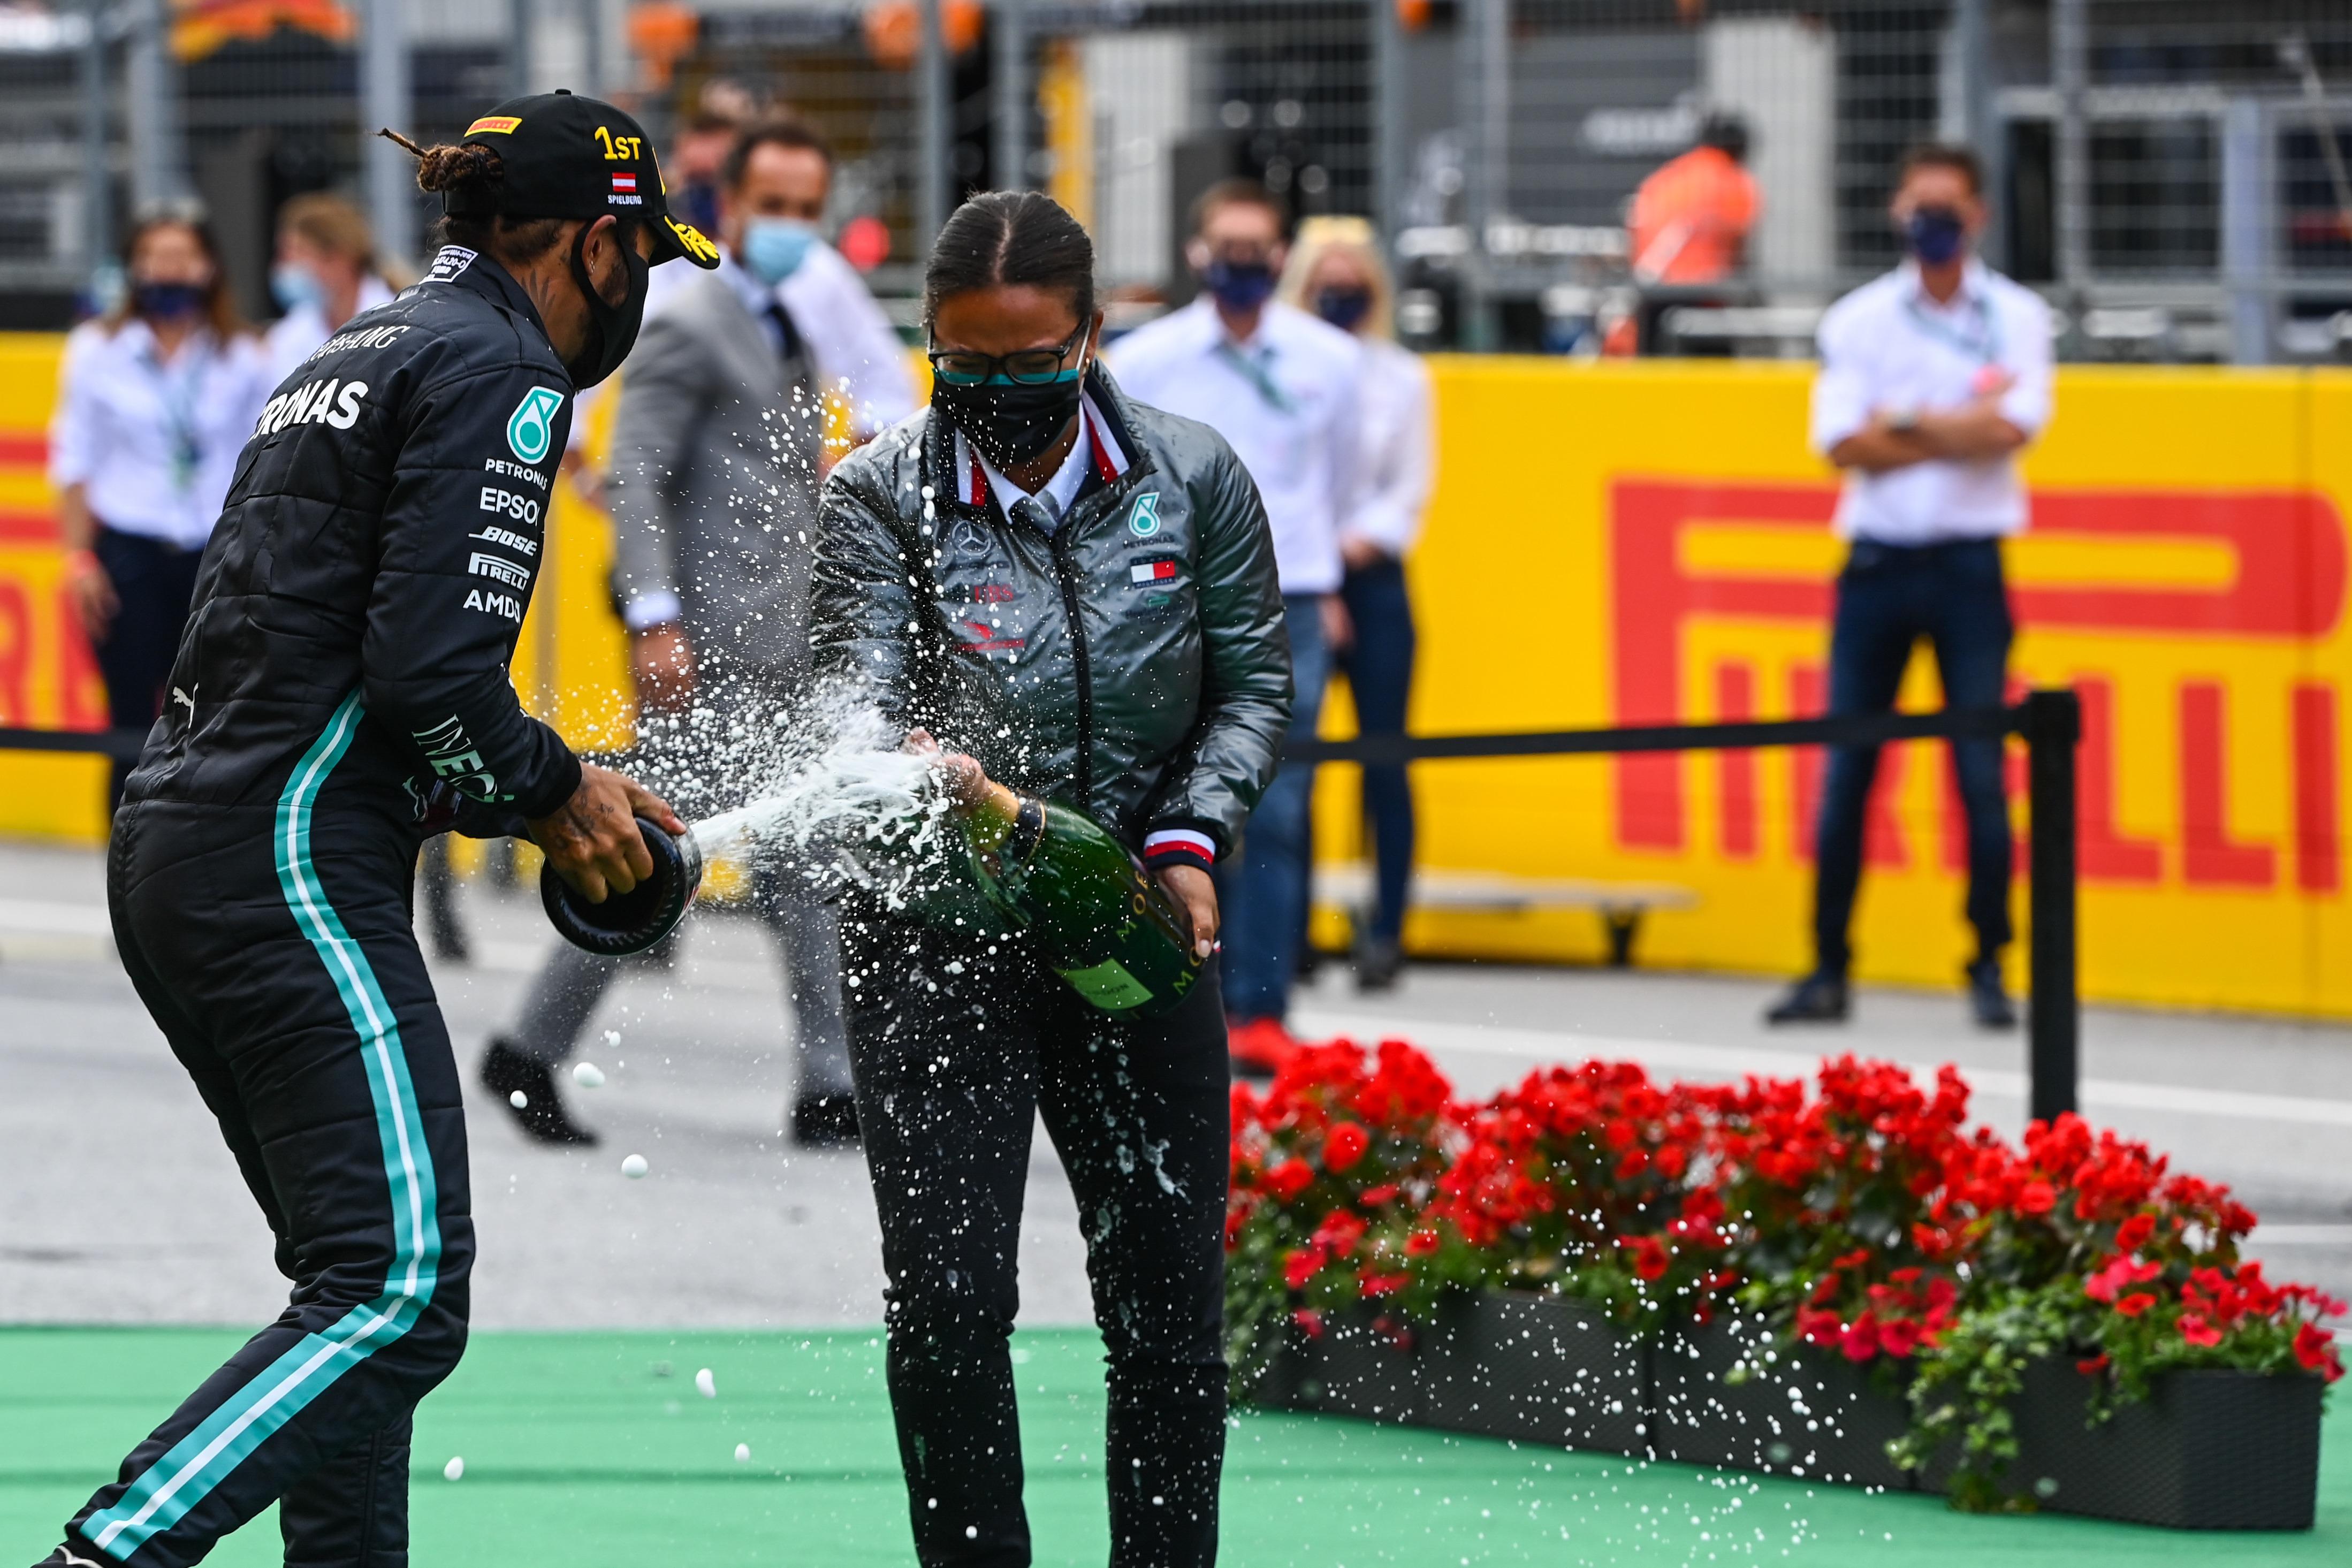 Lewis Hamilton, GP de Estiria 2020